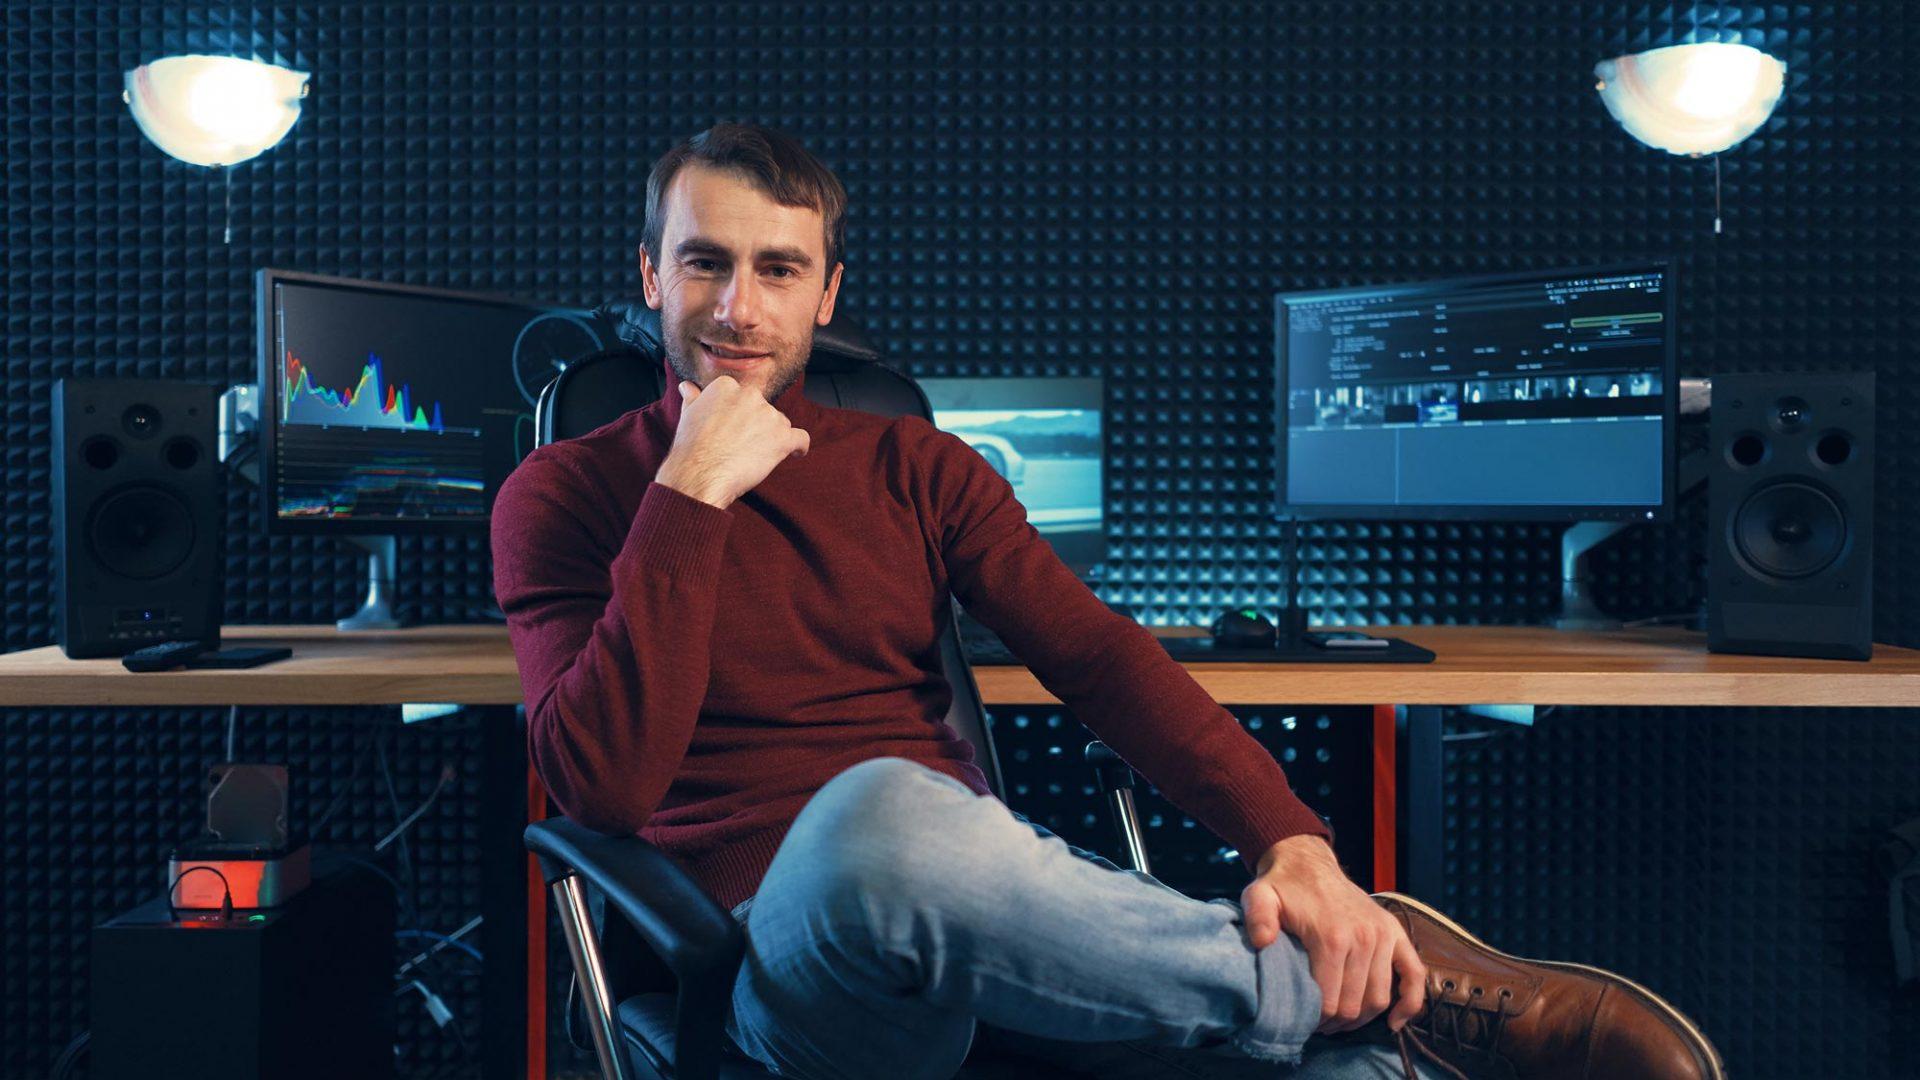 successful-designer-or-editor-sitting-leg-over-leg-F8WGYS2